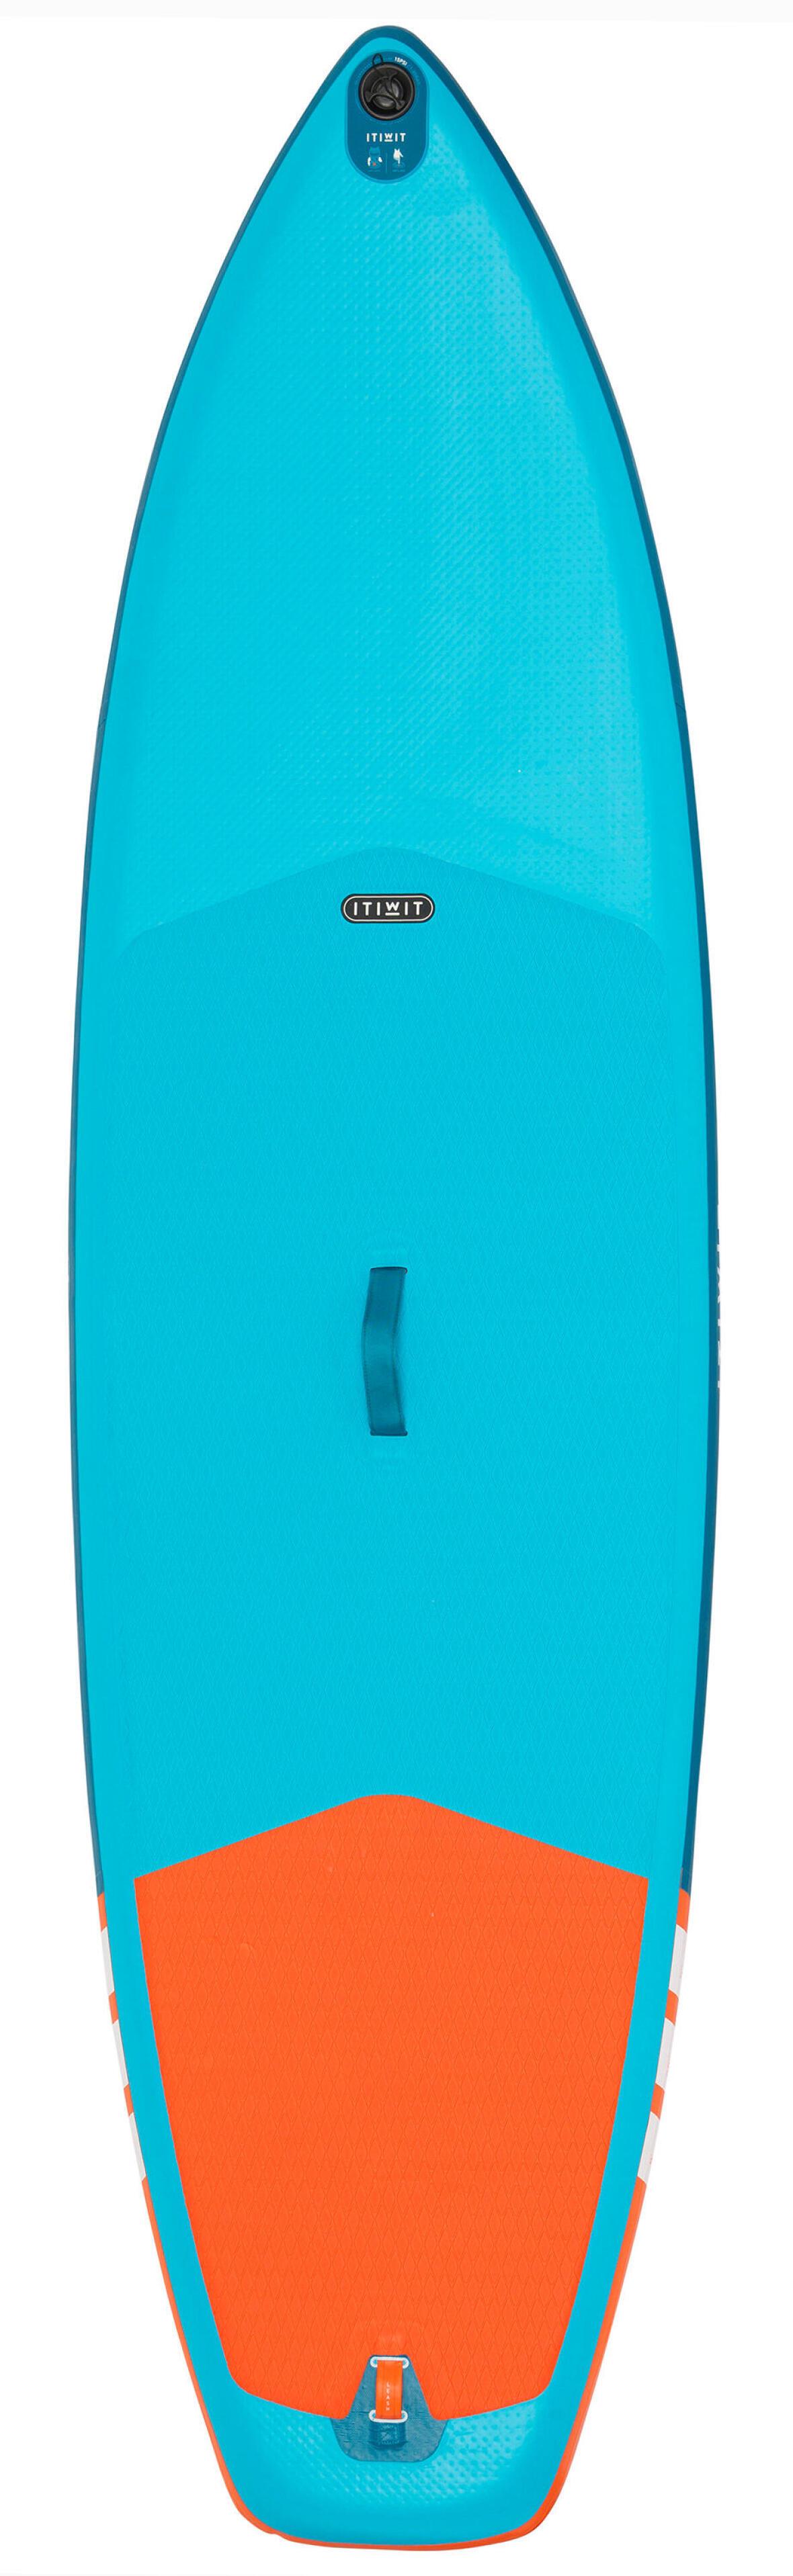 itiwit-sup-insuflável-x100-9-azul-decathlon